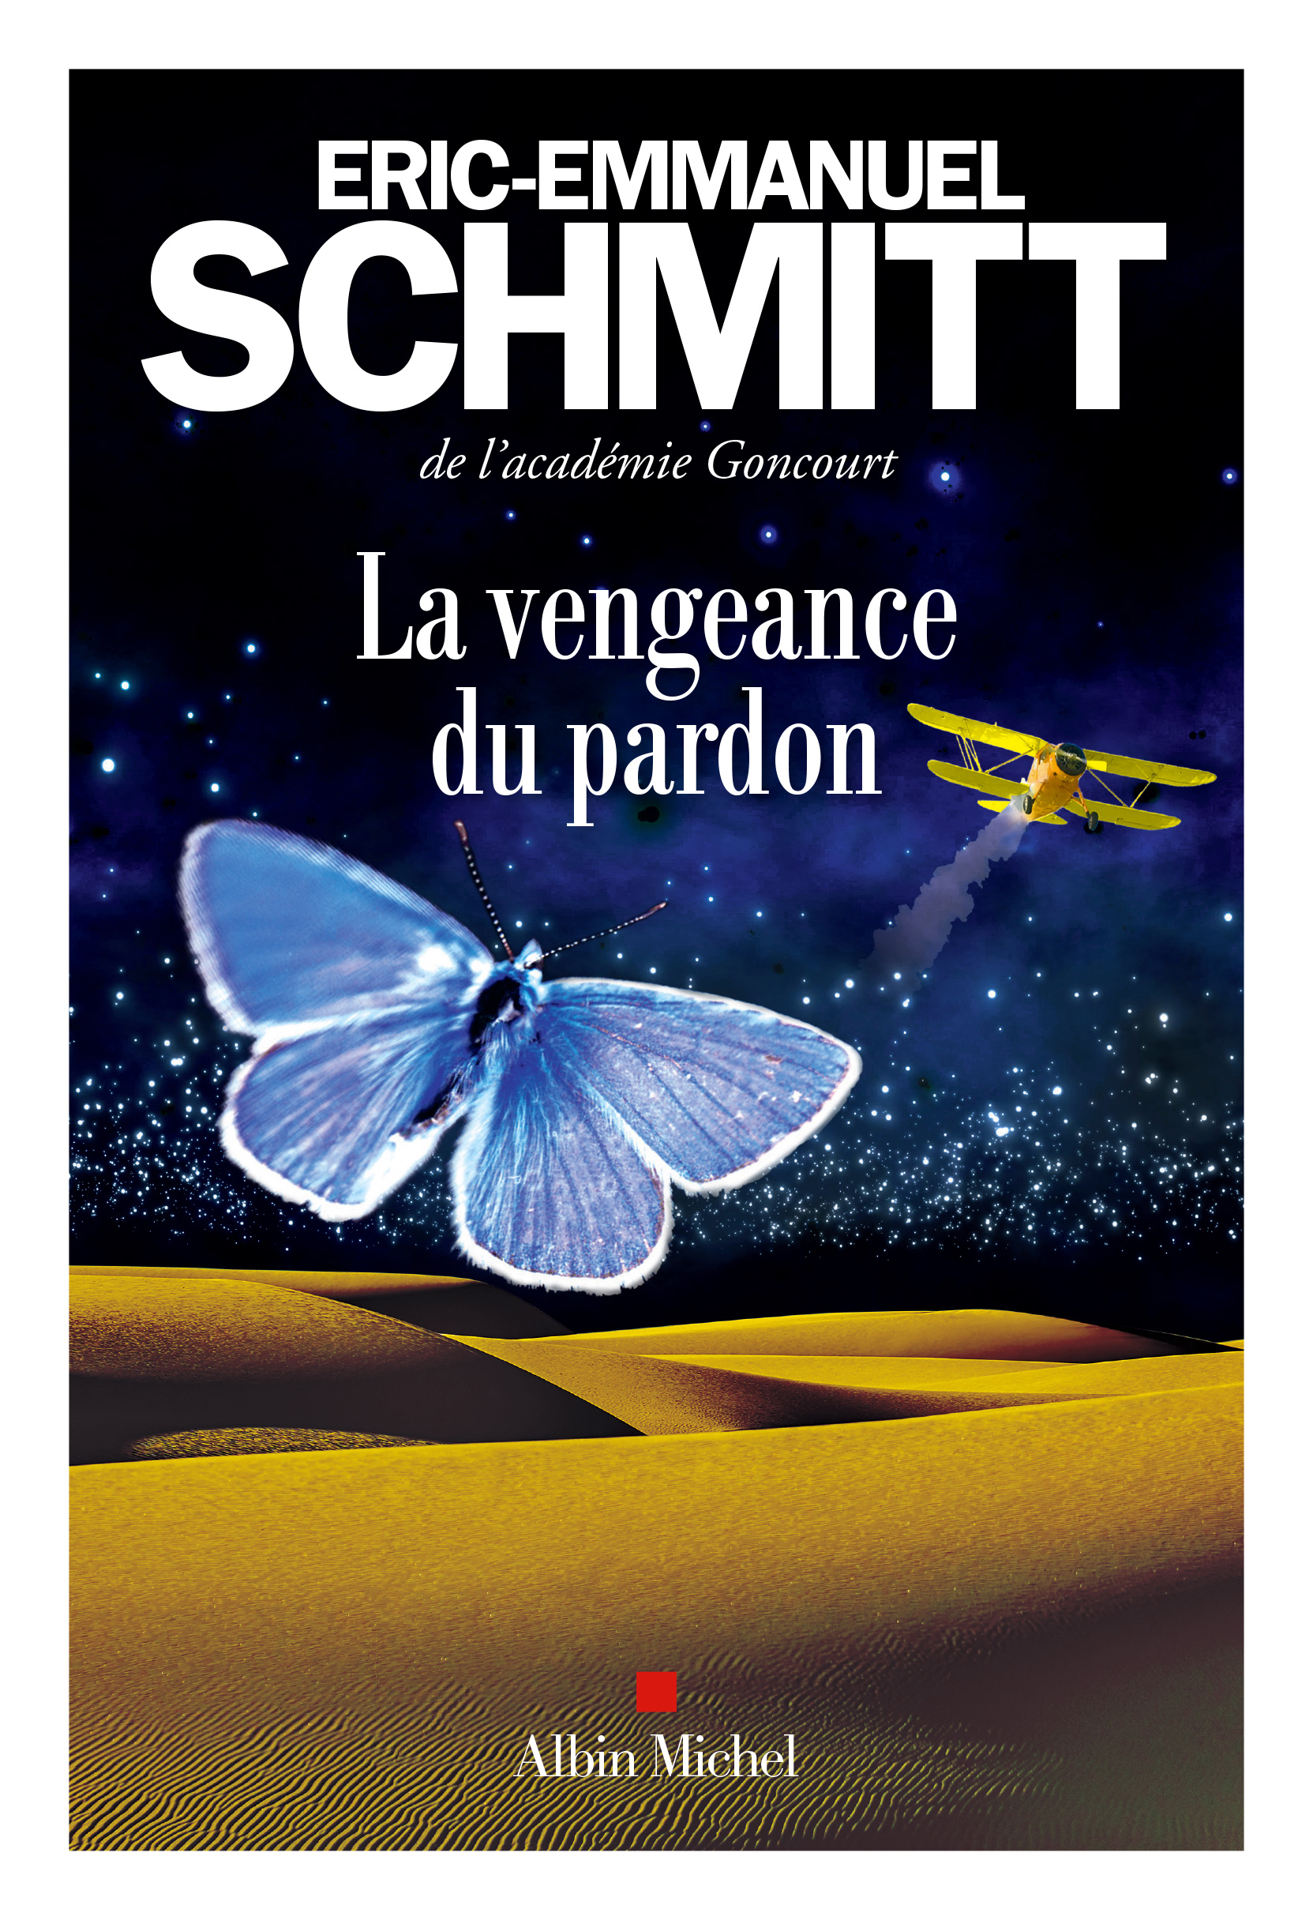 J'ai lu « La vengeance du pardon » Eric-Emmanuel Schmitt, Babelio.